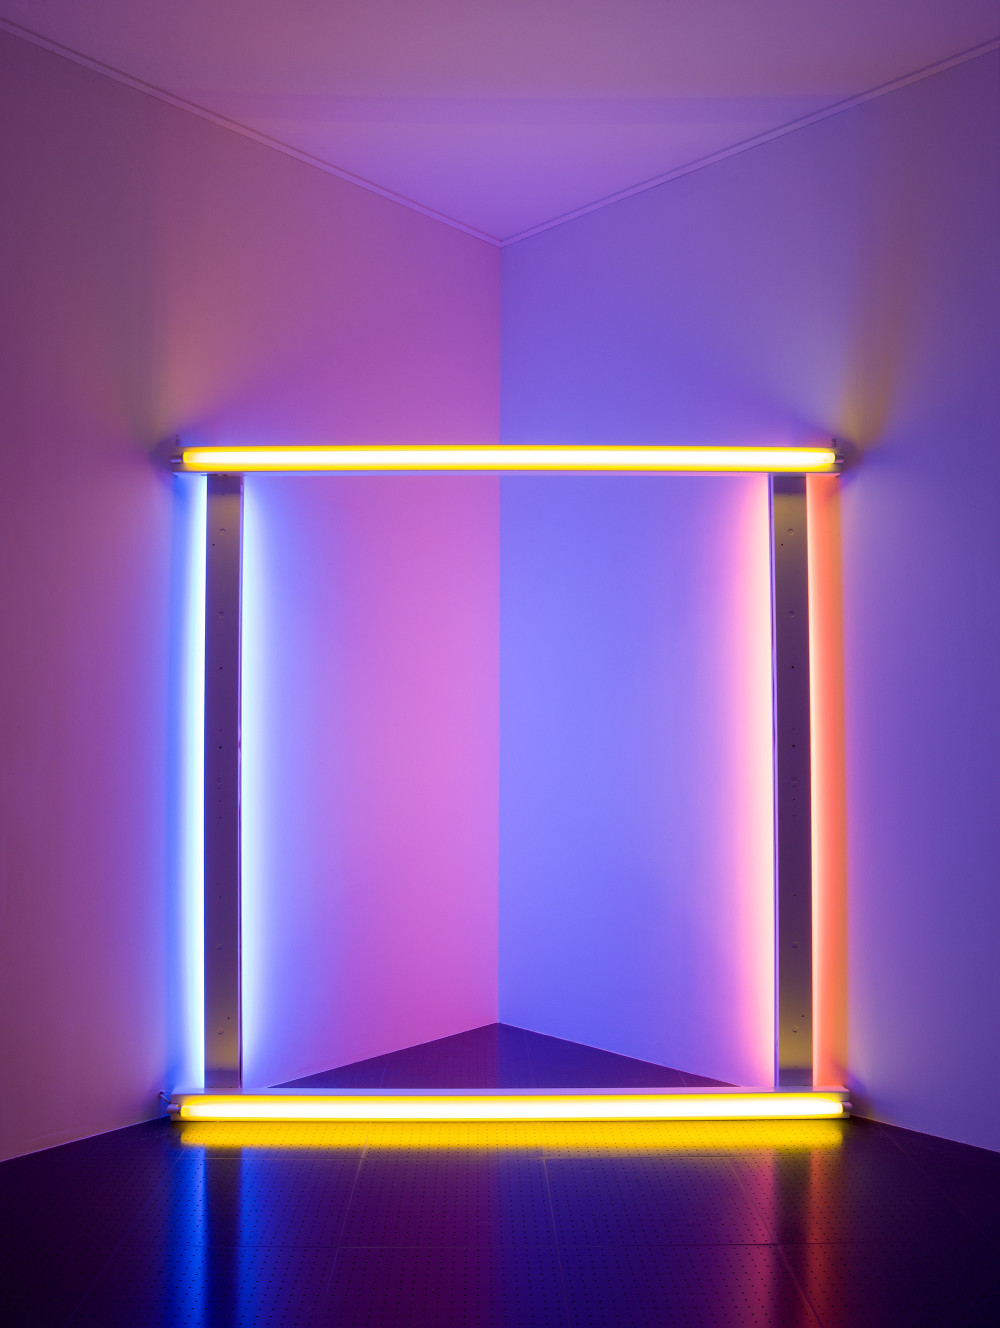 "untitled (to Donna) 5, In the exhibition ""Phares"", Centre Pompidou-Metz, february 2014© Dan Flavin© Centre Pompidou, MNAM-CCI/Bertrand Prévost/Dist. RMN-GP© Adagp, Paris© SABAM Belgium 2018"